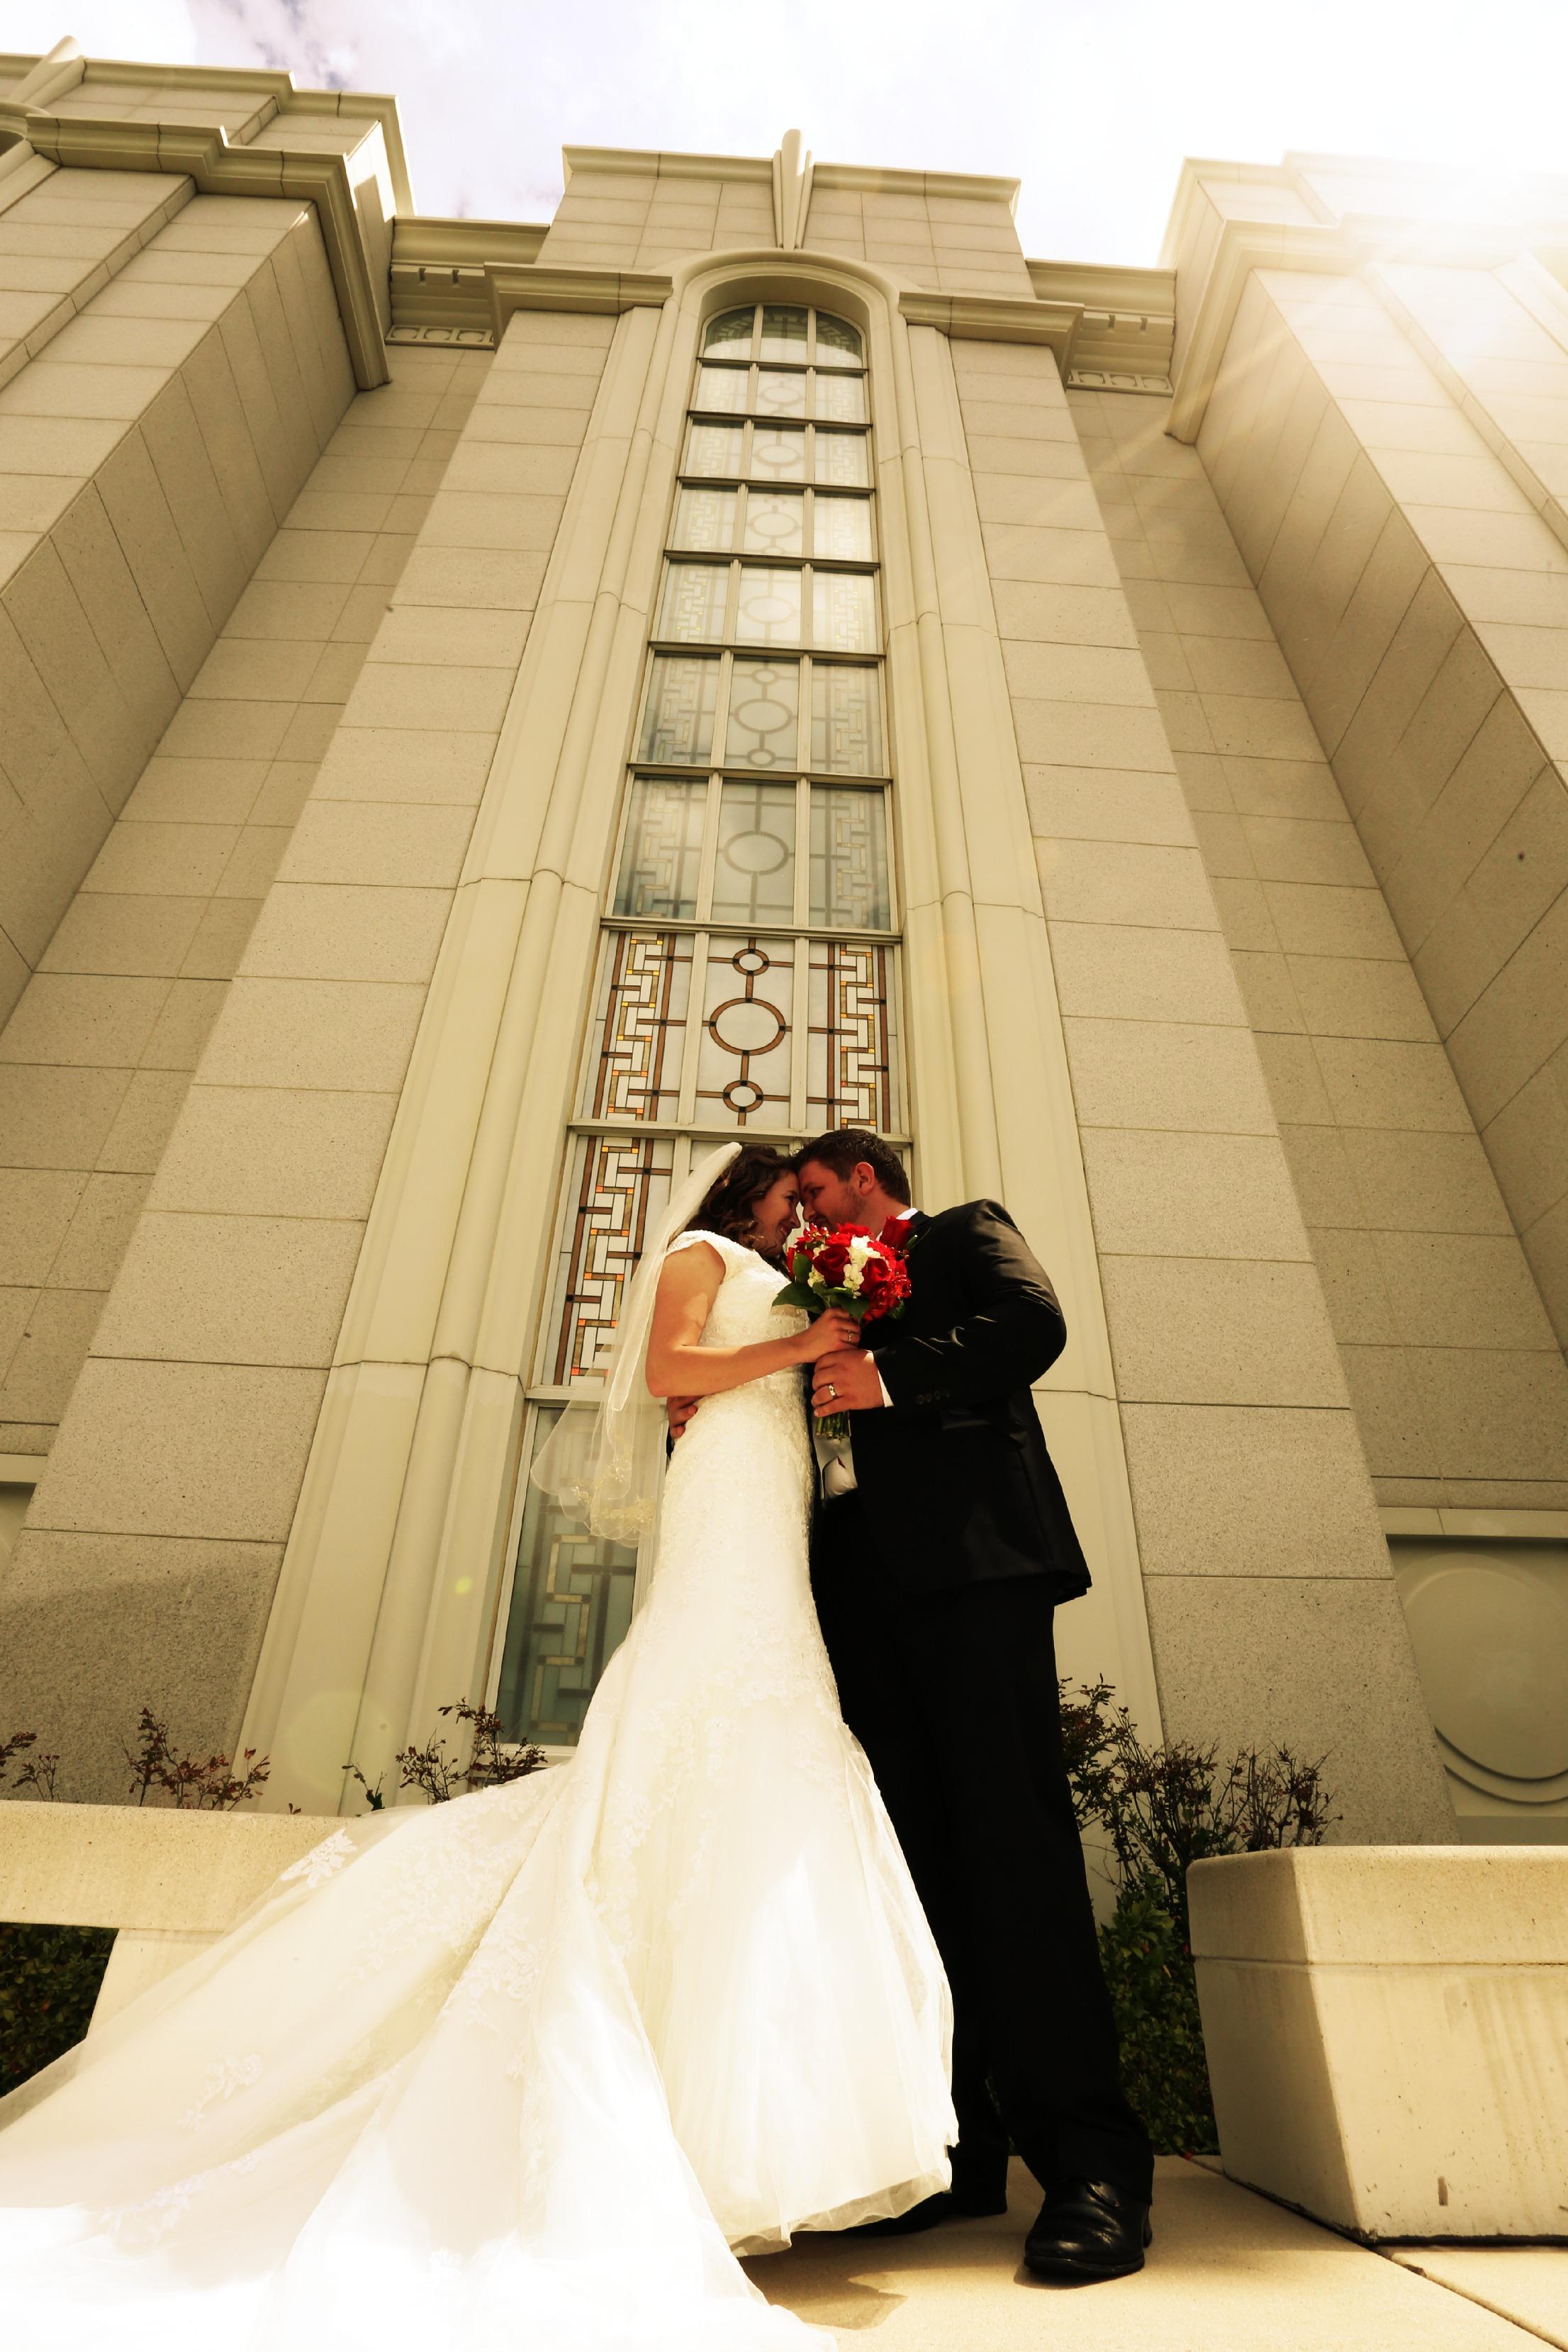 Bountiful wedding photography located in Davis Count Utah.